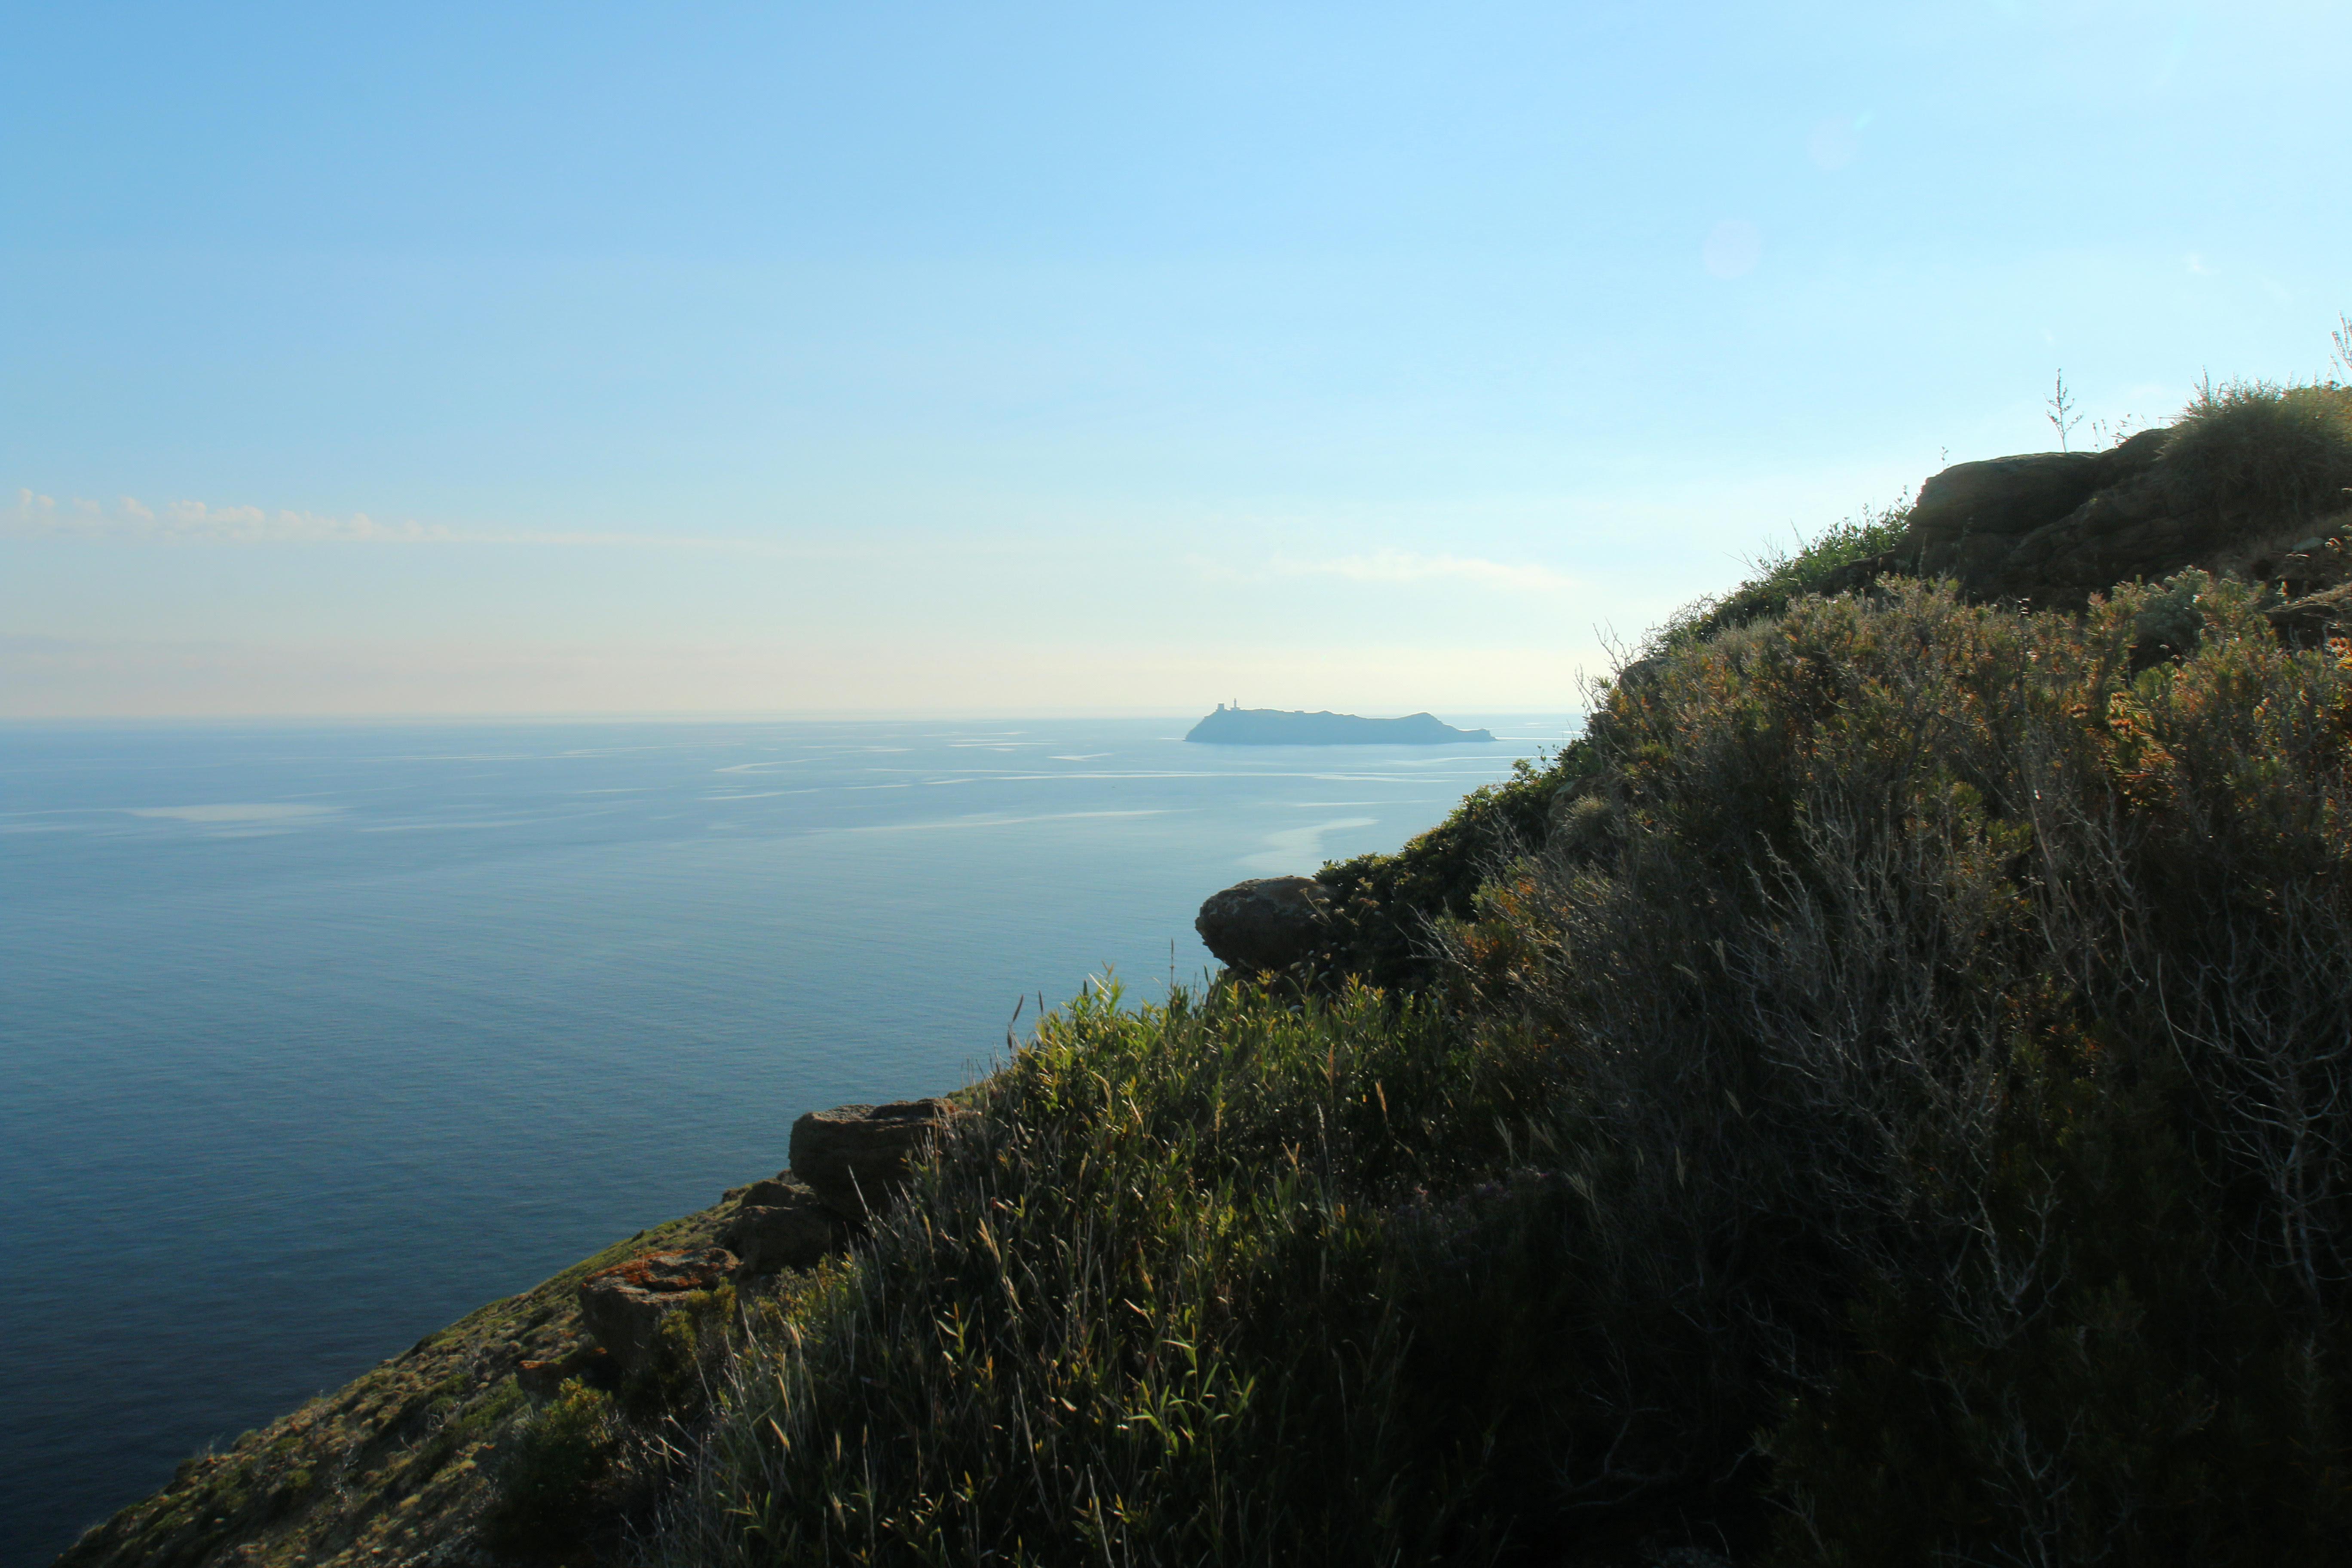 Au large de la pointe du Cap Corse, la Giraglia (Hyacinthe Sambroni)